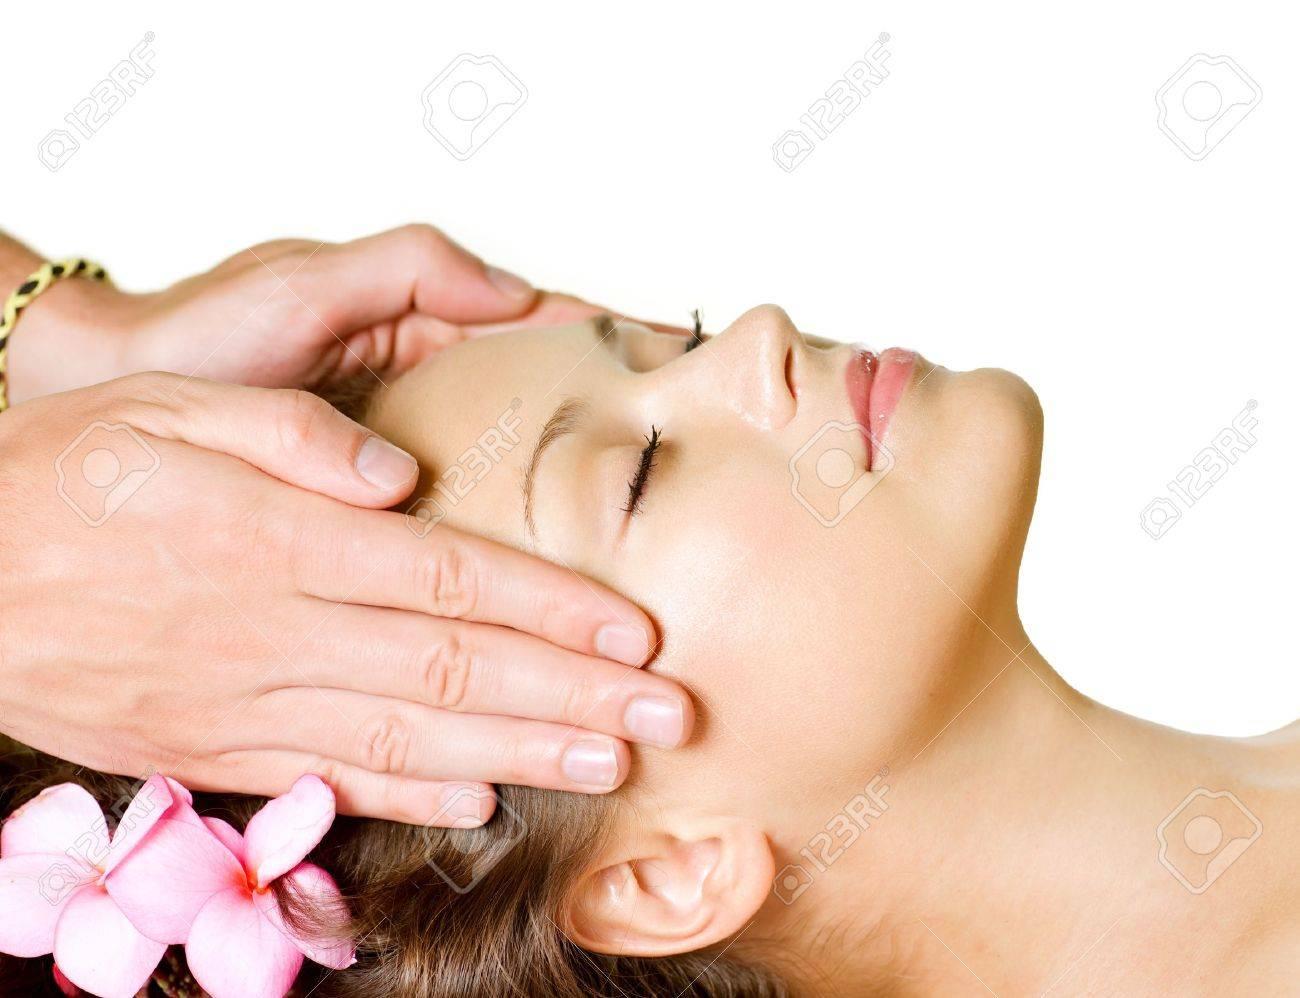 Spa Massage  Beauty Woman Getting Facial Massage  Day-Spa Stock Photo - 13260702